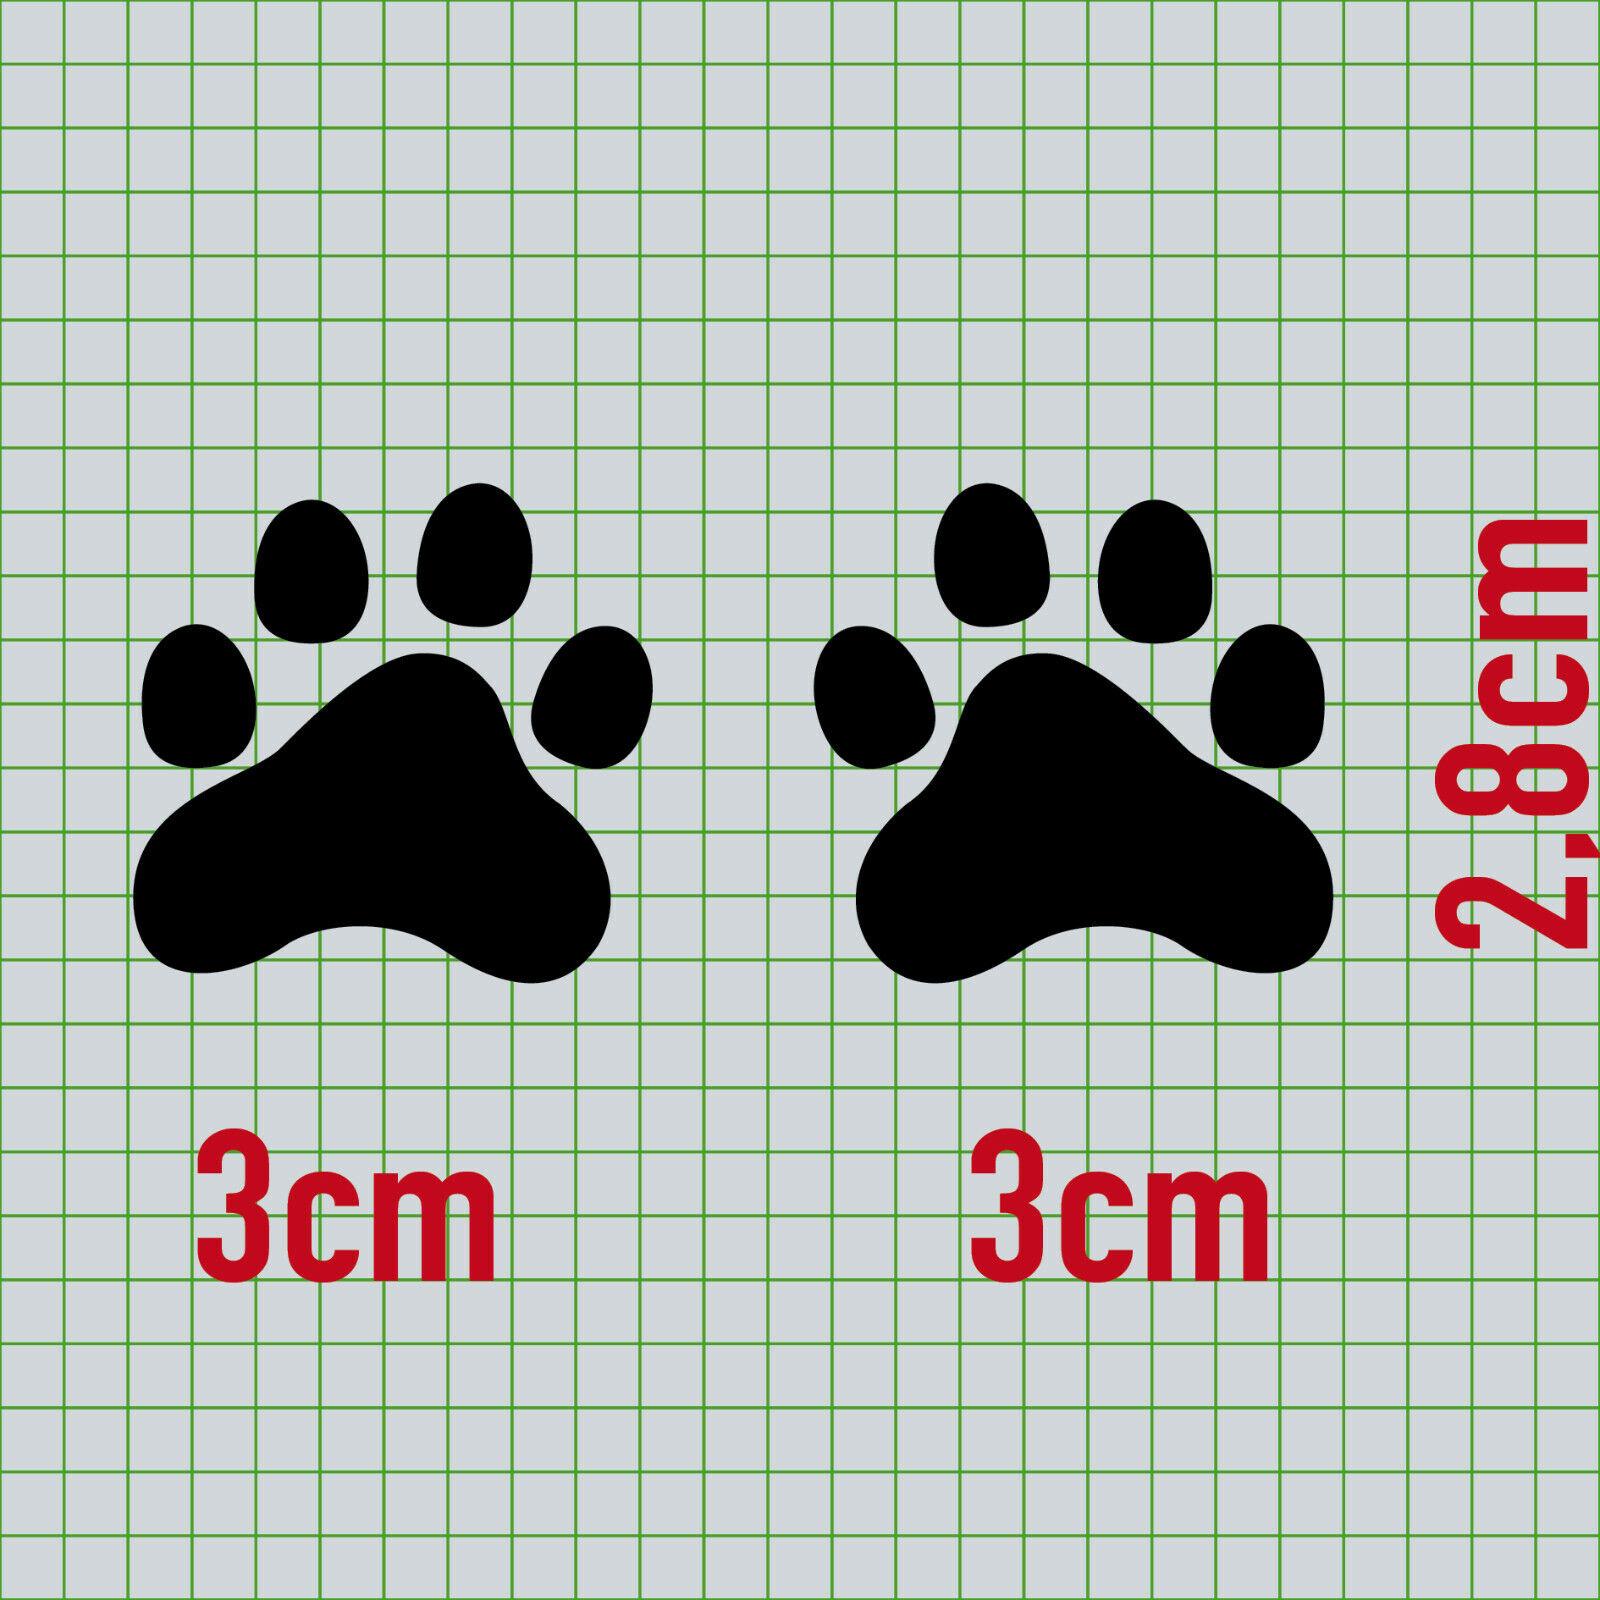 10 Pfötchen Schwarz Pfote 3cm Hund Katze Spur Tatzen Auto Aufkleber Deko Folie